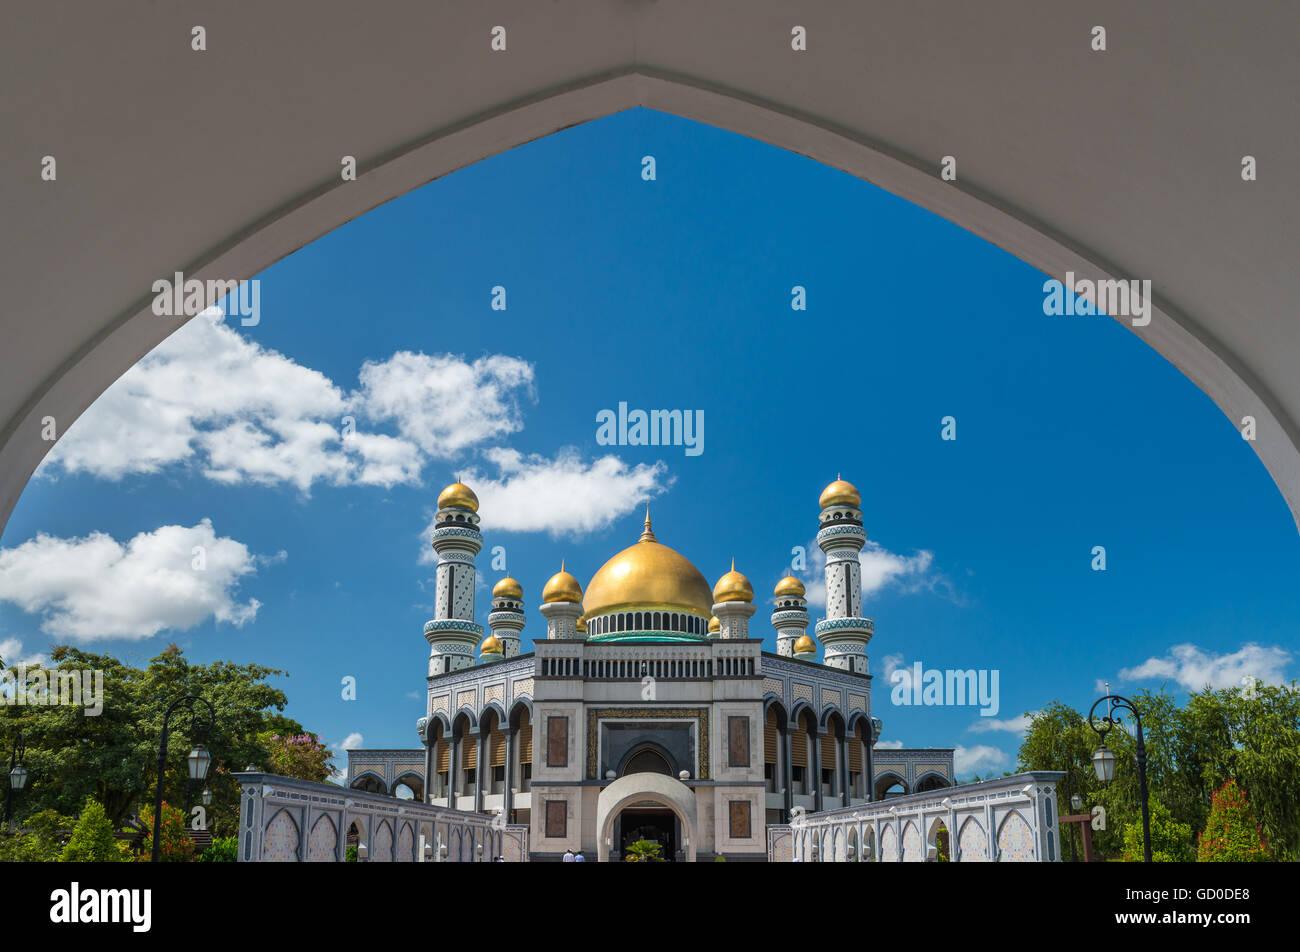 Jame'Asr Hassanil Bolkiah Mosque in Bandar Seri Begawan, Brunei. - Stock Image